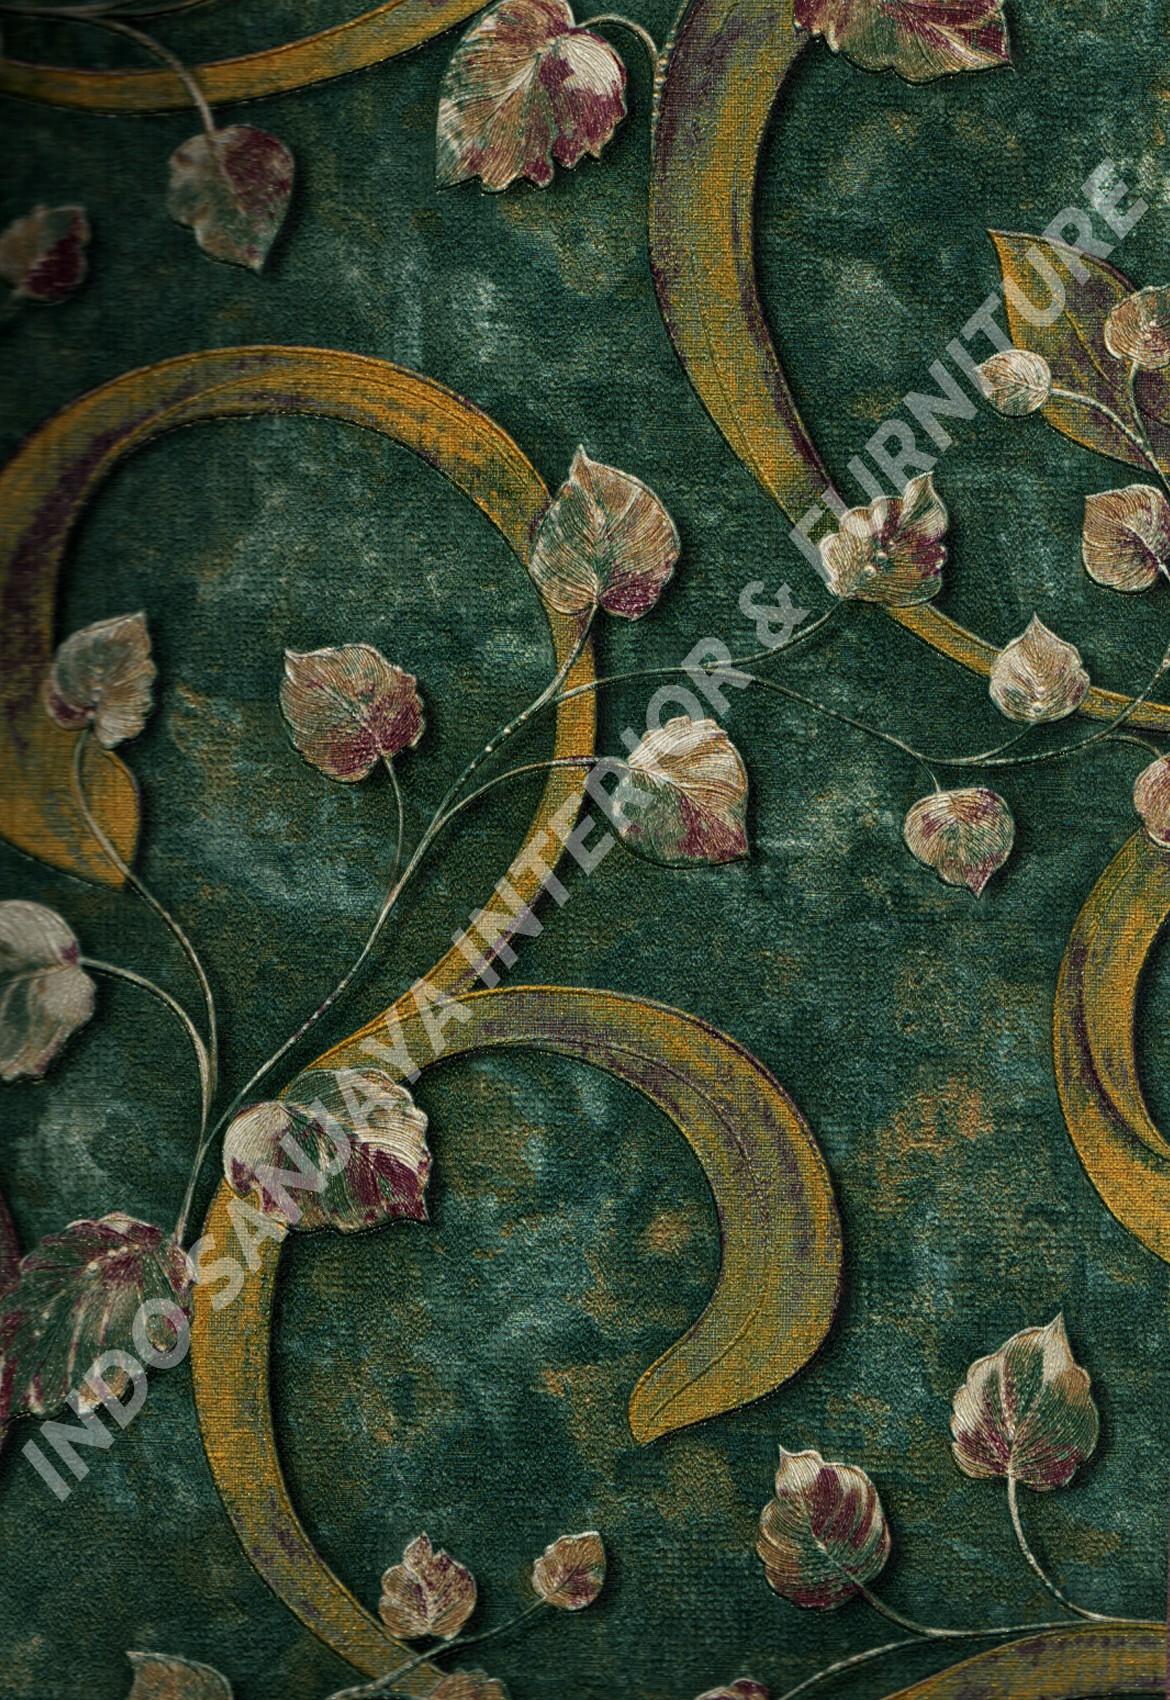 wallpaper   Wallpaper Klasik Batik (Damask) DL10403:DL10403 corak  warna